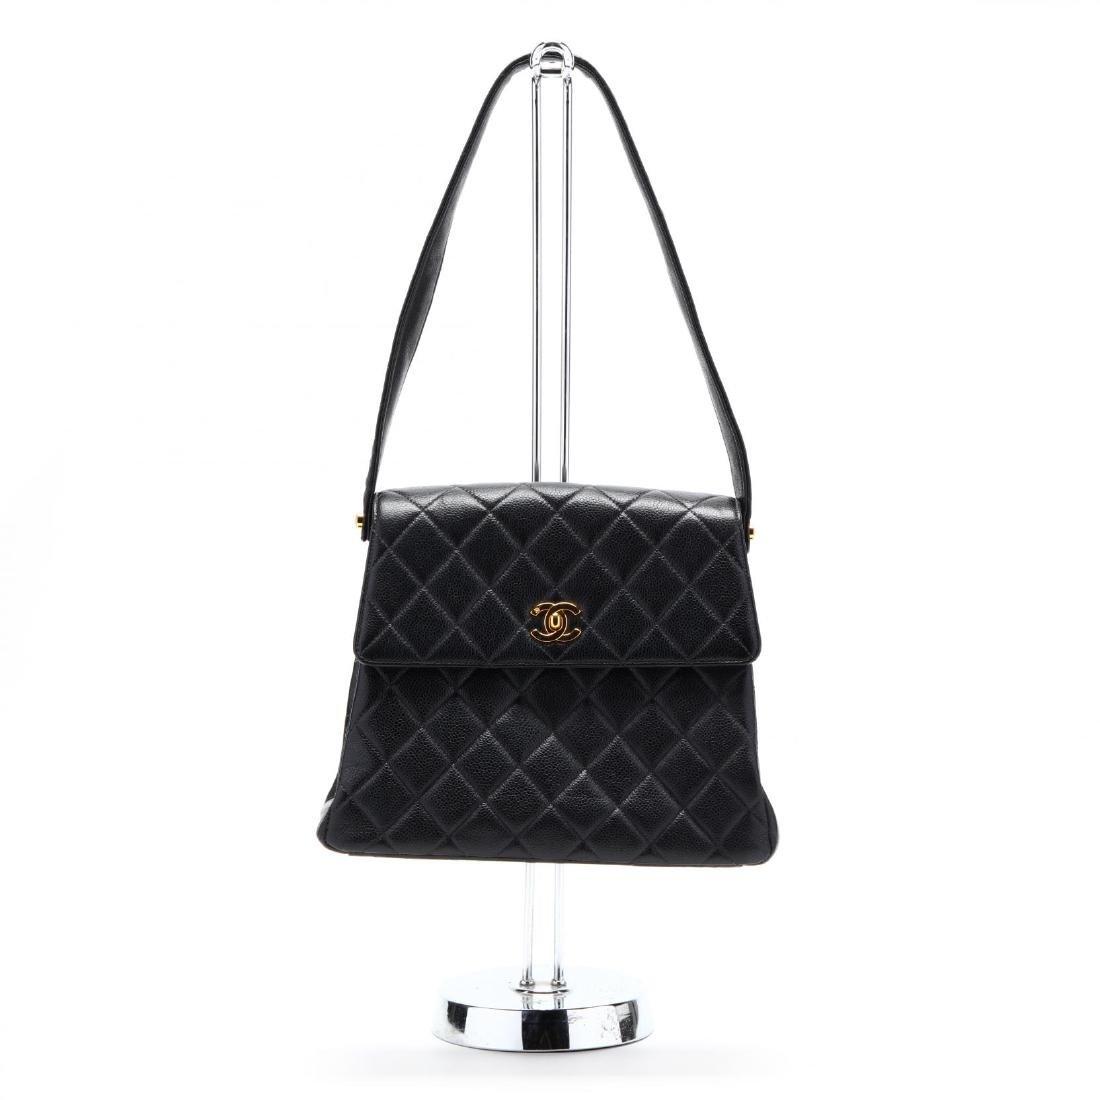 Caviar Leather Trapeze Flap Handbag, Chanel - 2